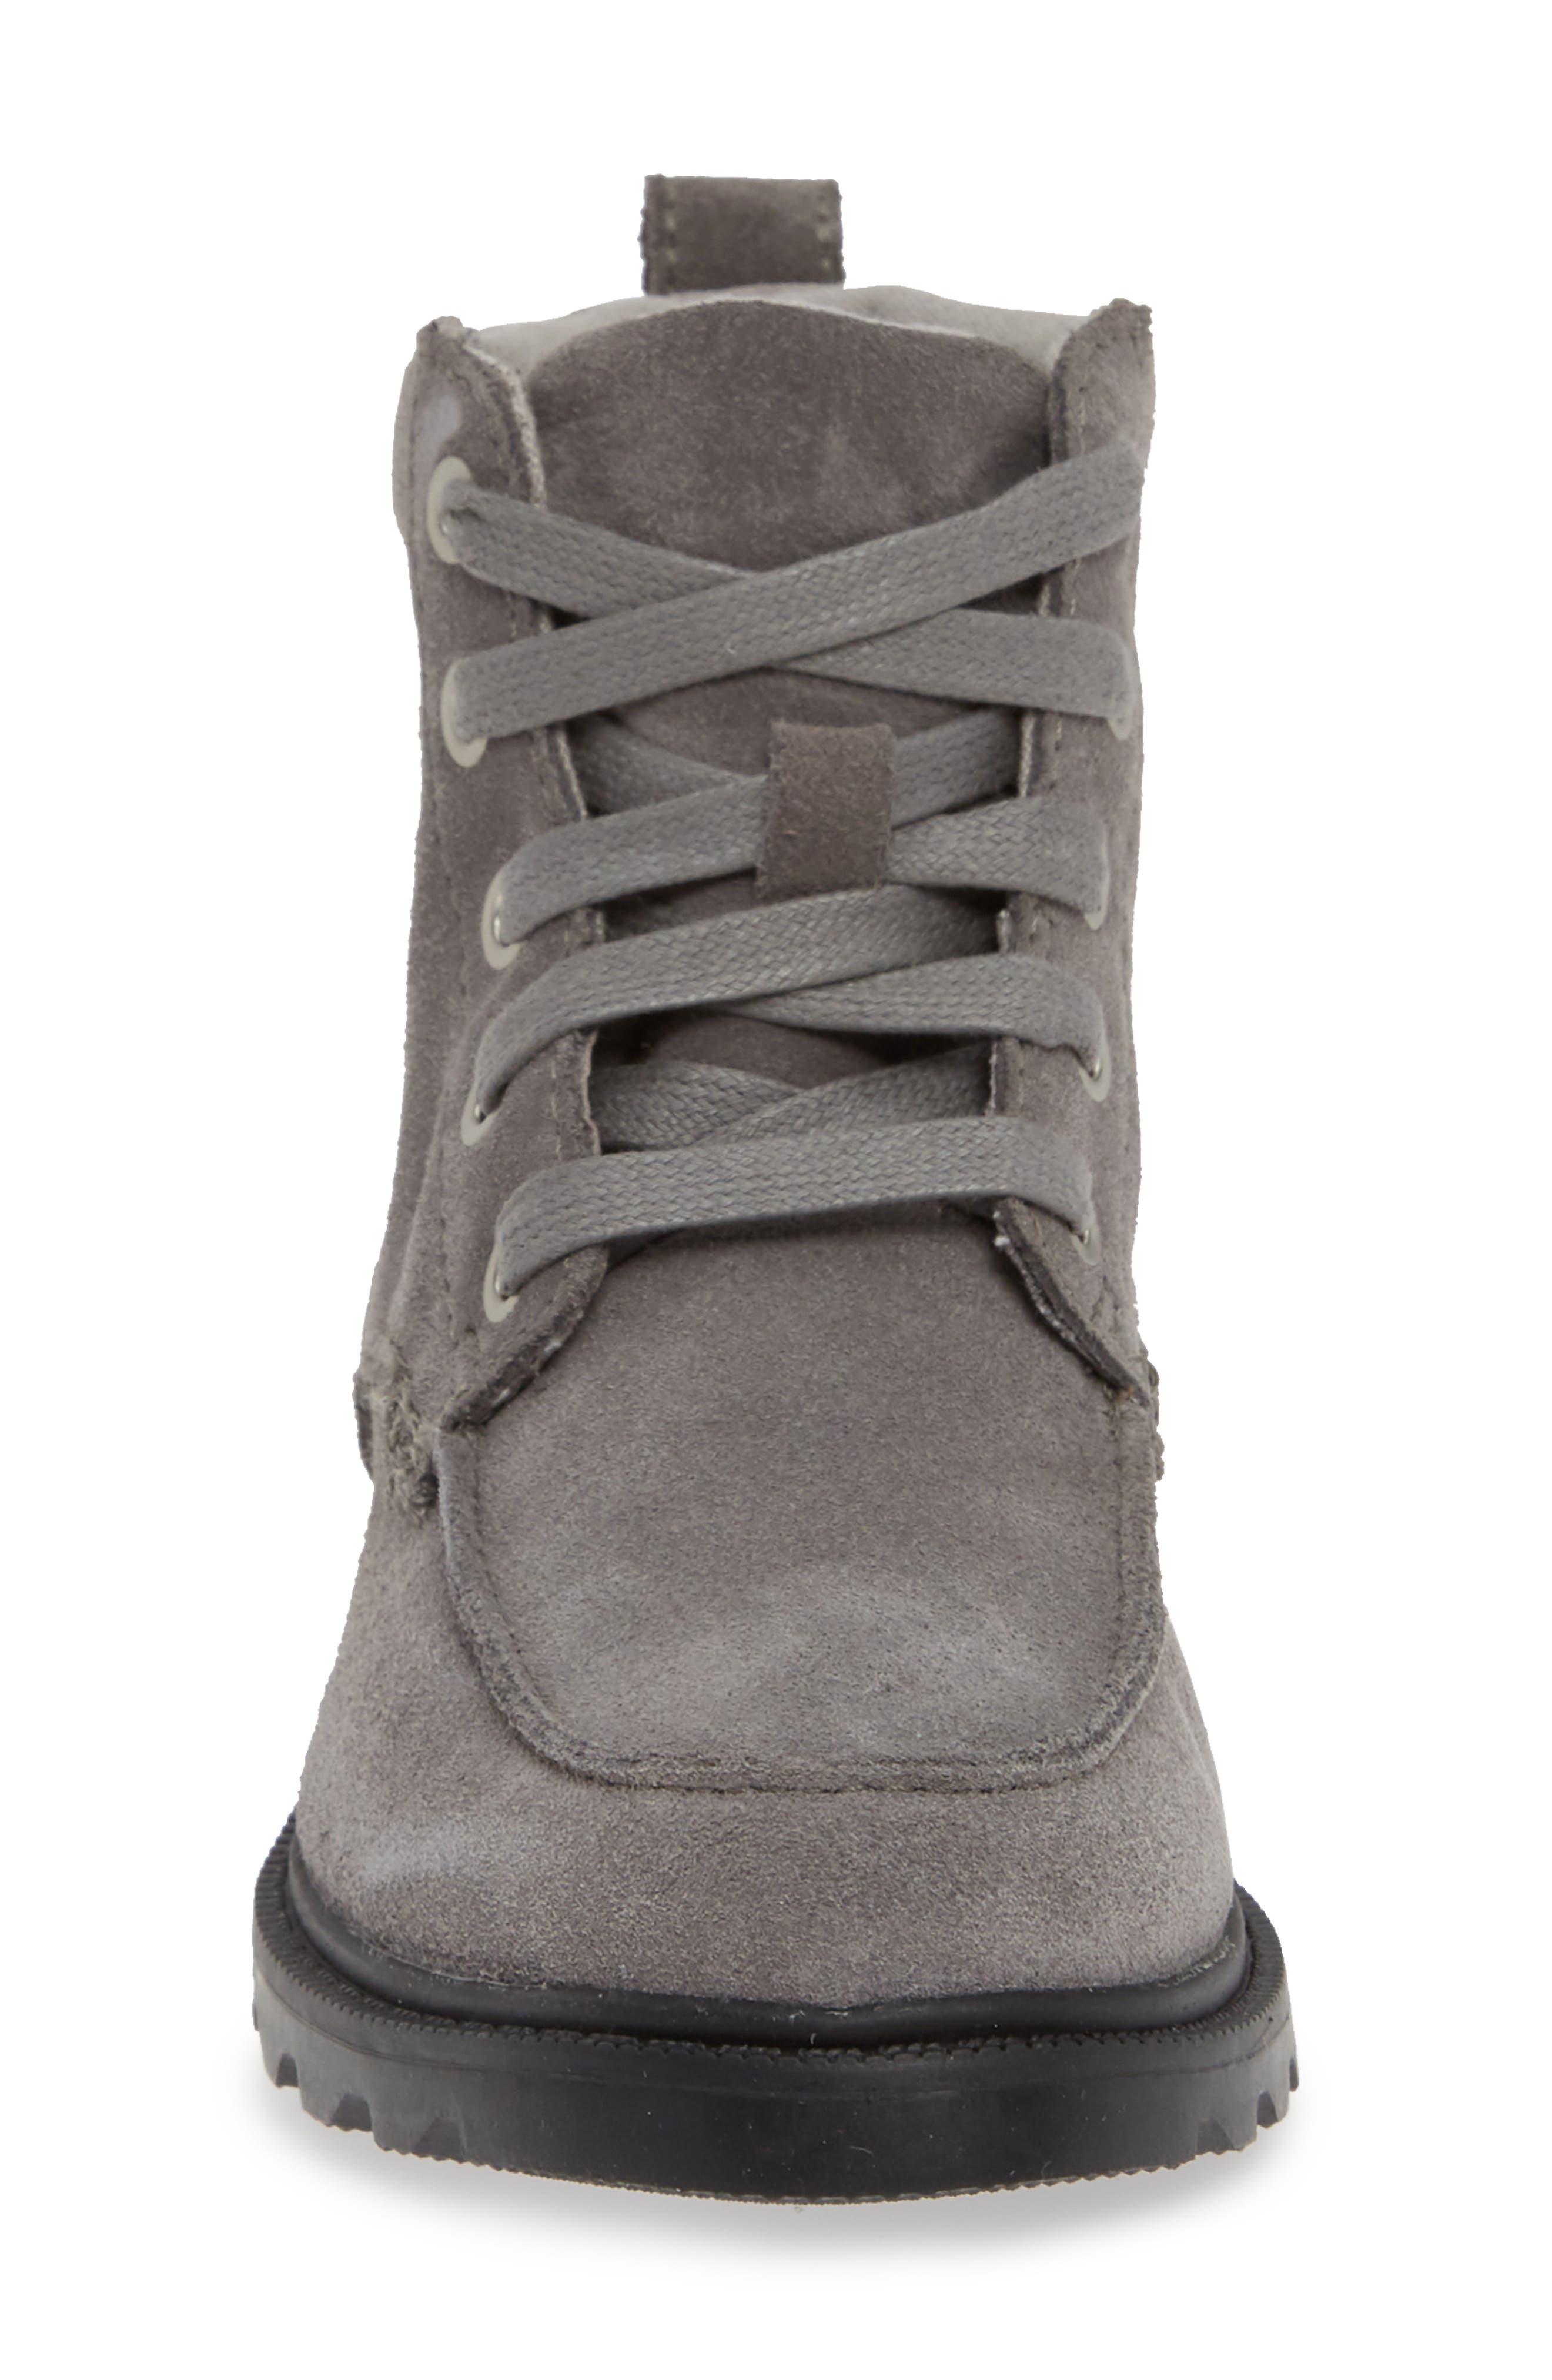 Madson Waterproof Moc Toe Boot,                             Alternate thumbnail 4, color,                             QUARRY/ CHROME